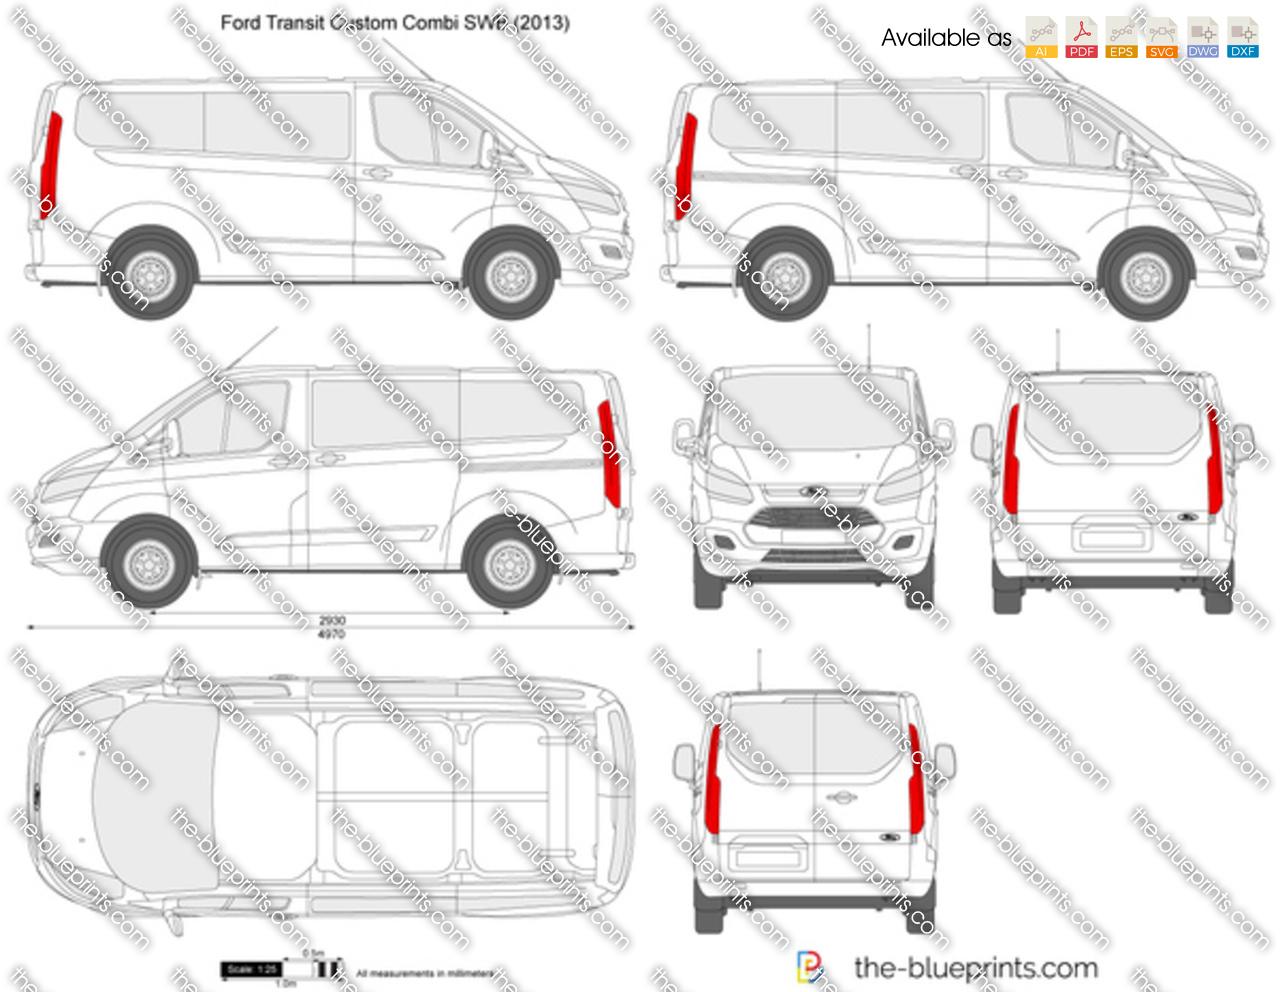 Ford Transit Custom Combi SWB 2015